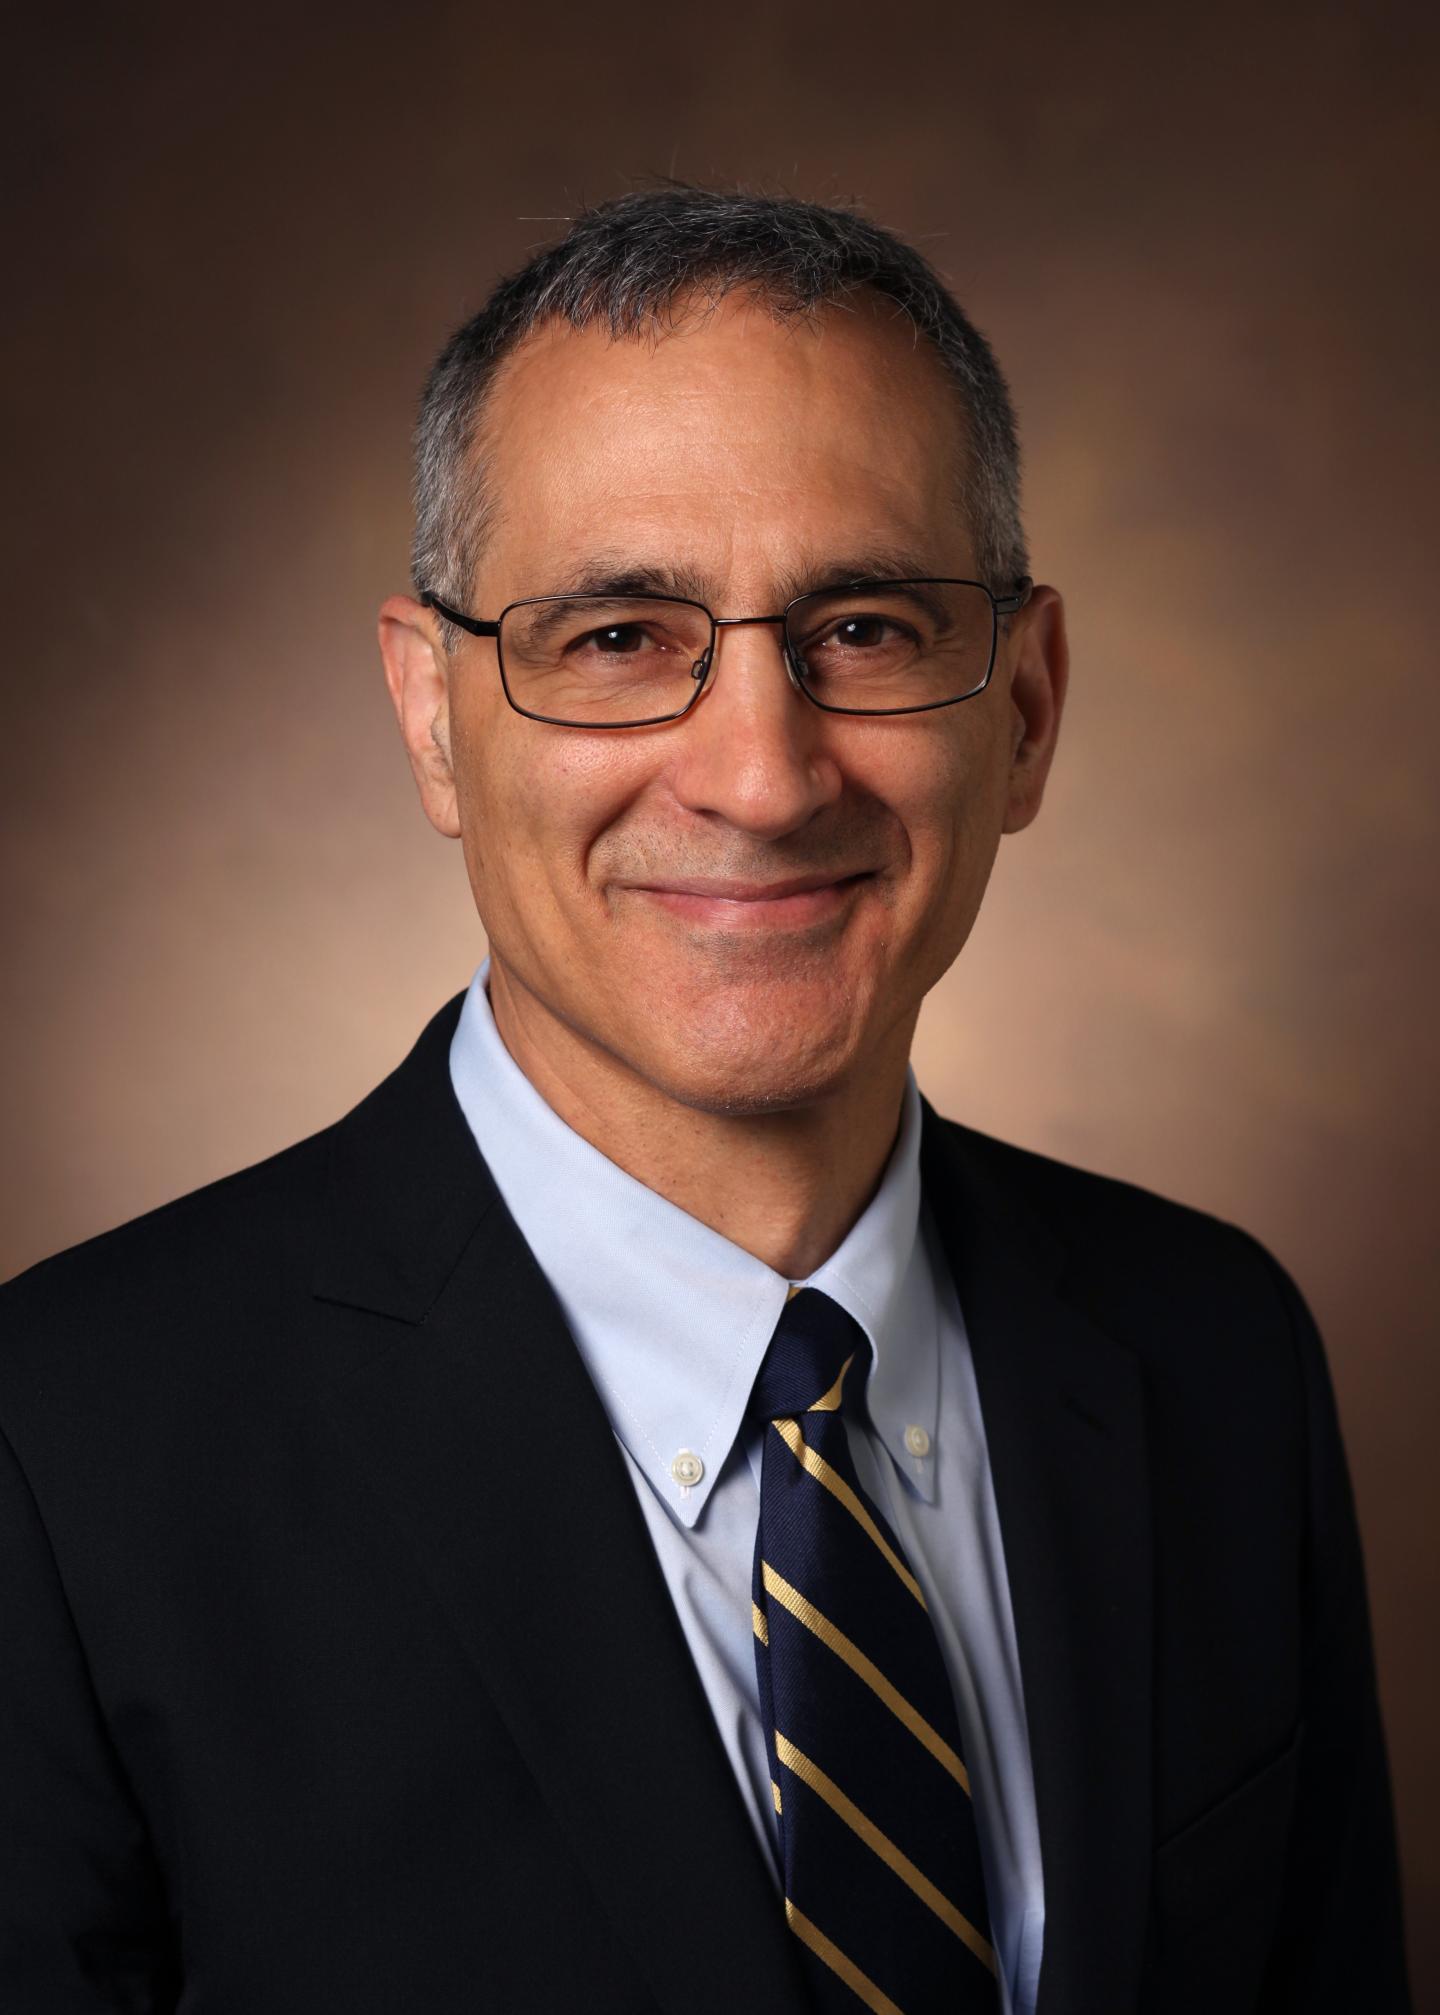 Dr. Matthew Bacchetta